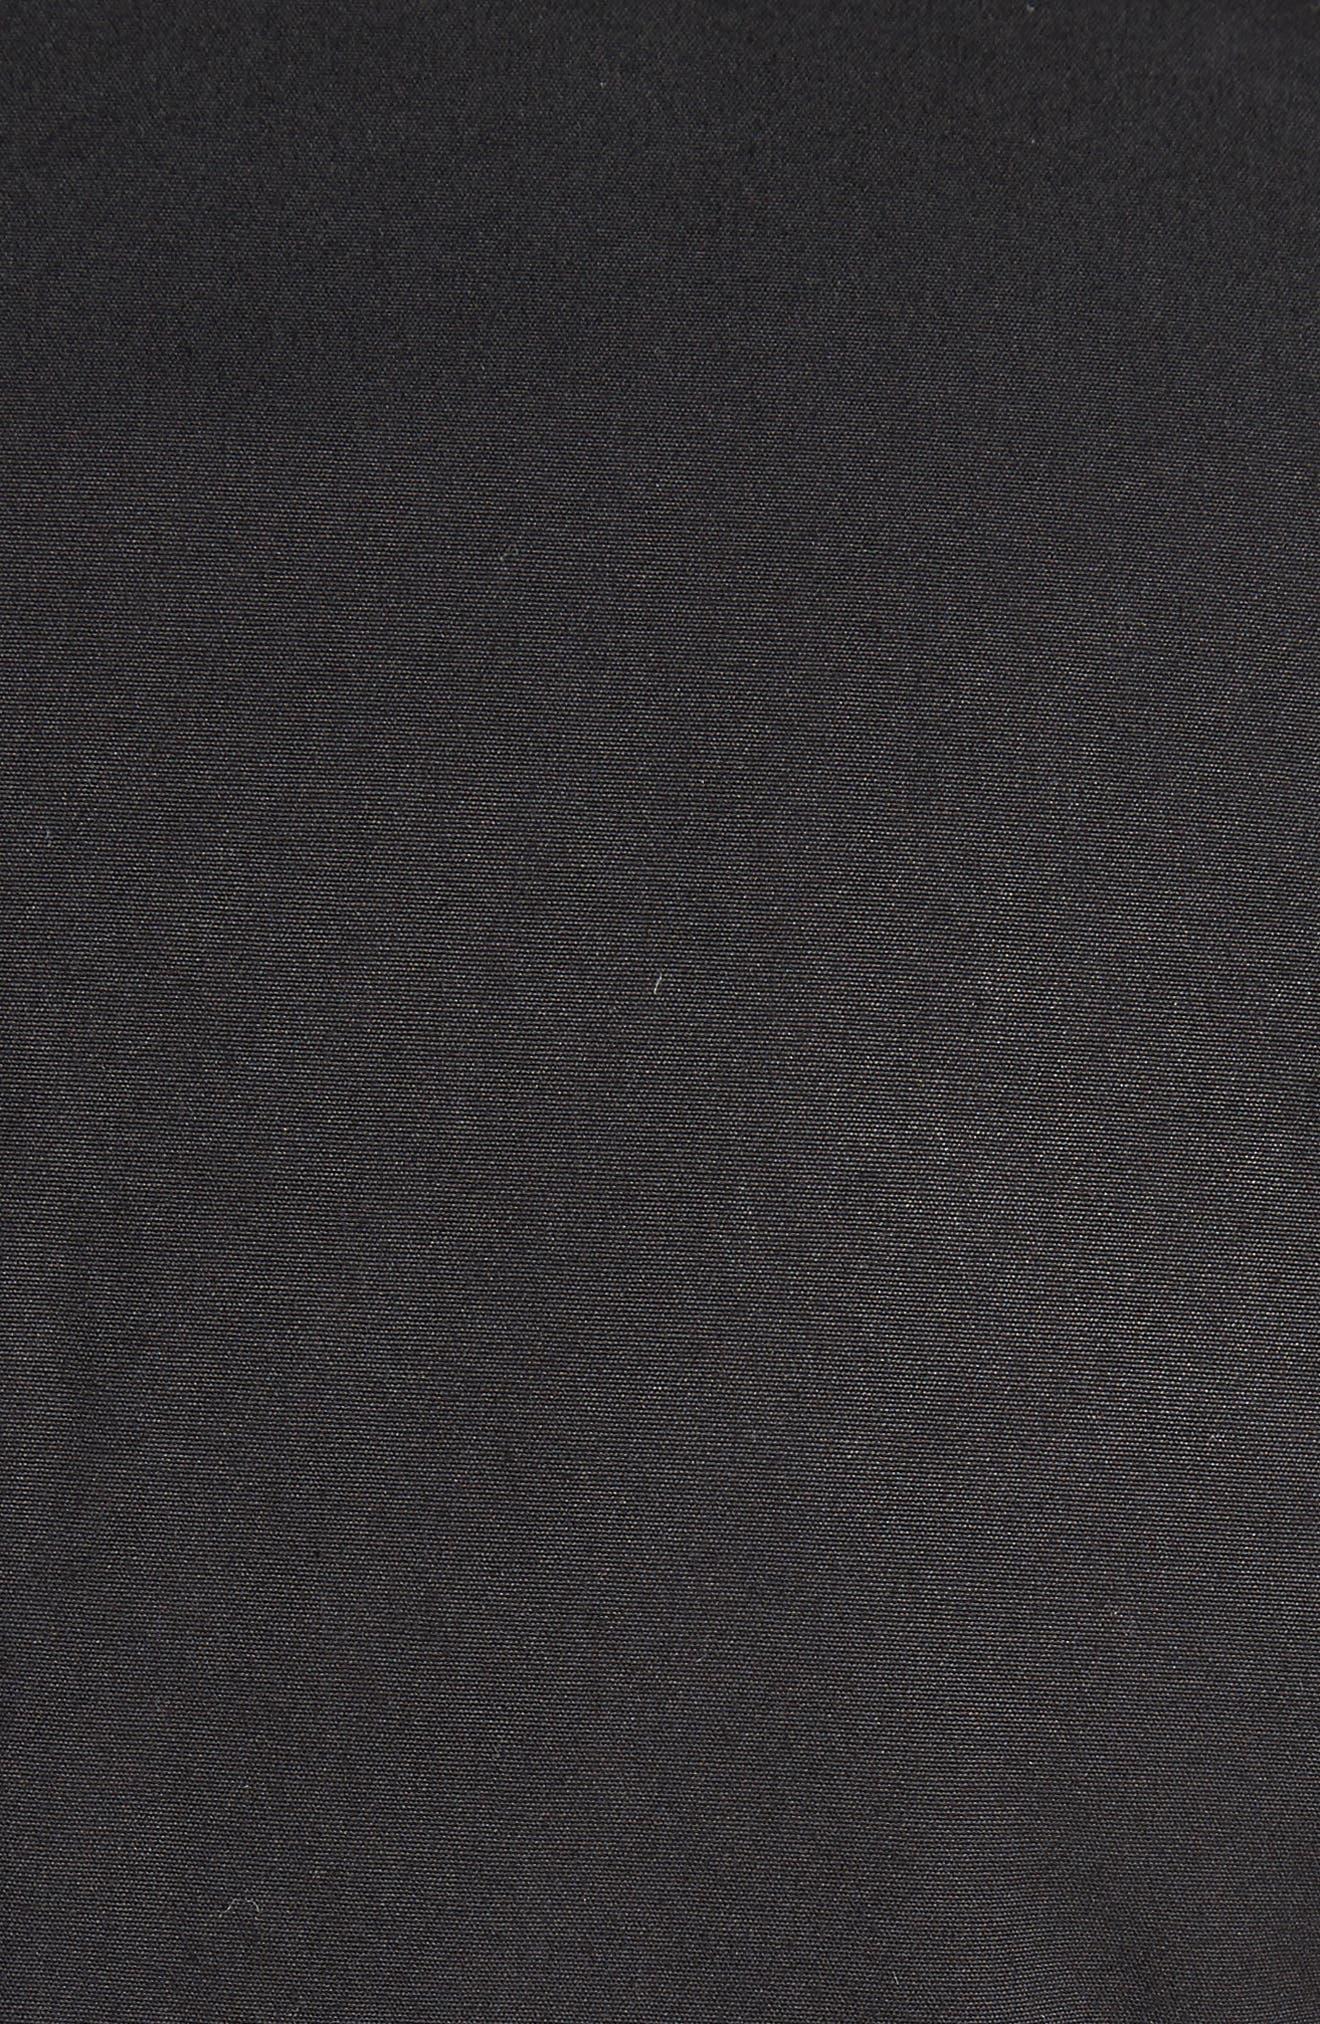 Alternate Image 3  - Rick Owens Stretch Cotton Biker Jacket